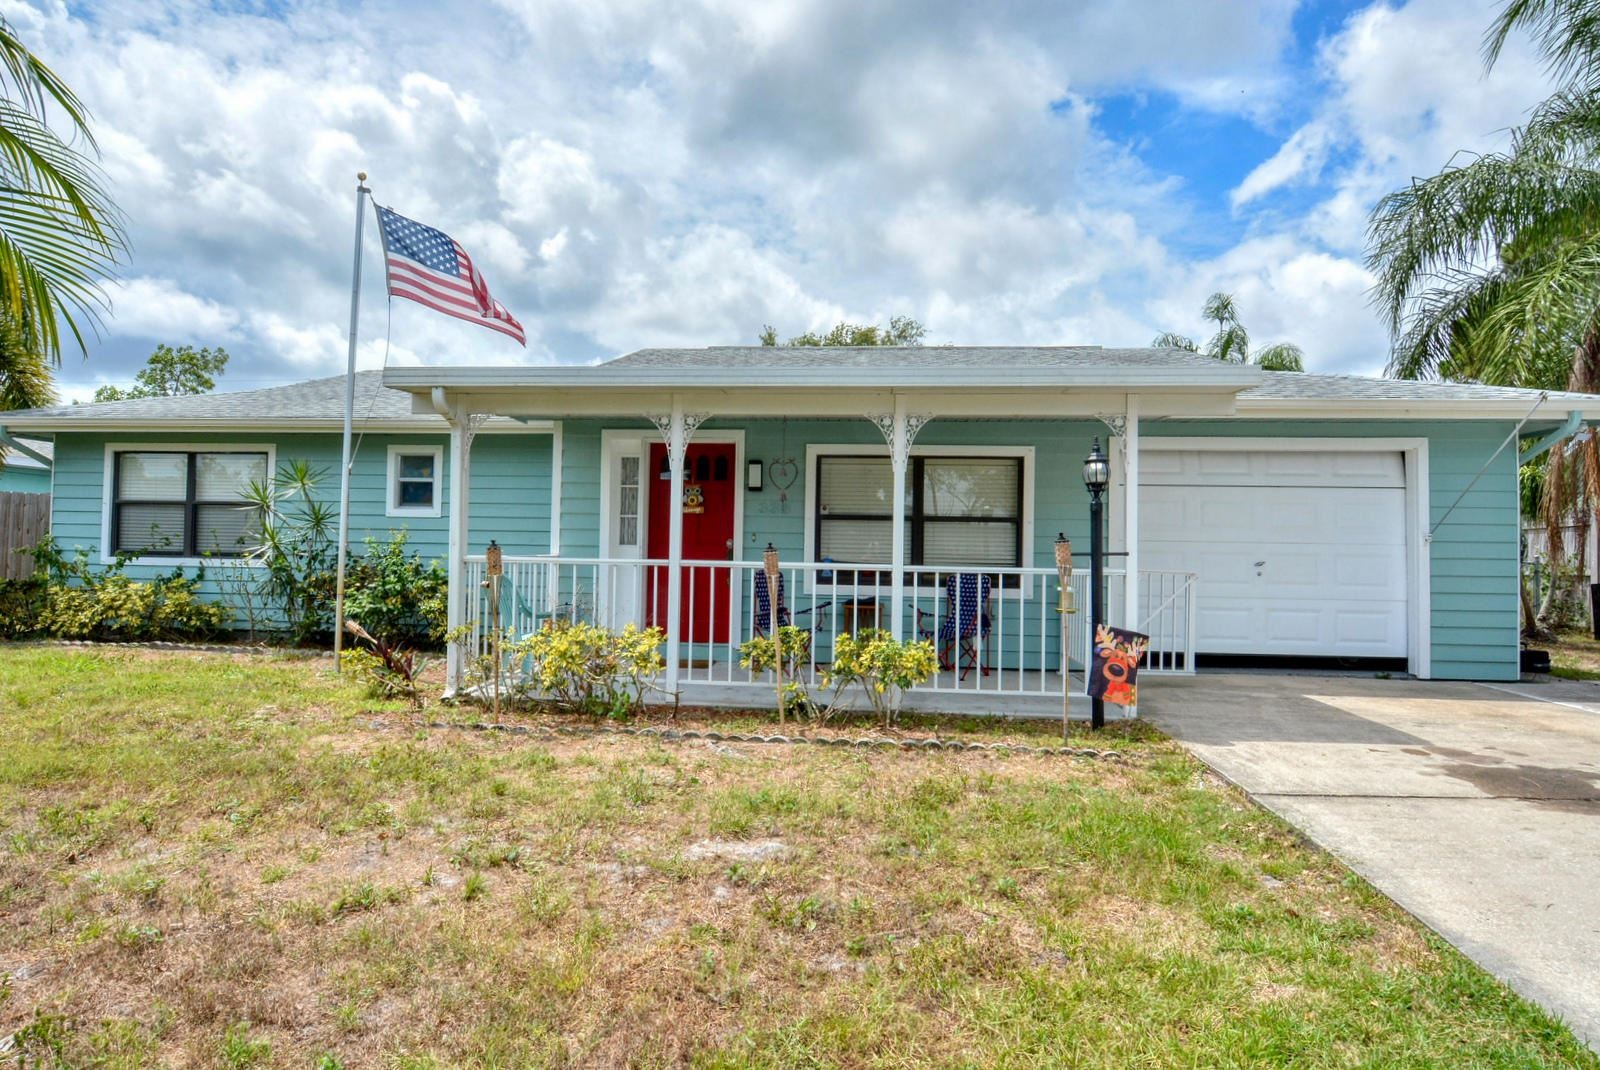 Photo of 338 NE Greenbrier Avenue, Port Saint Lucie, FL 34983 (MLS # RX-10715530)